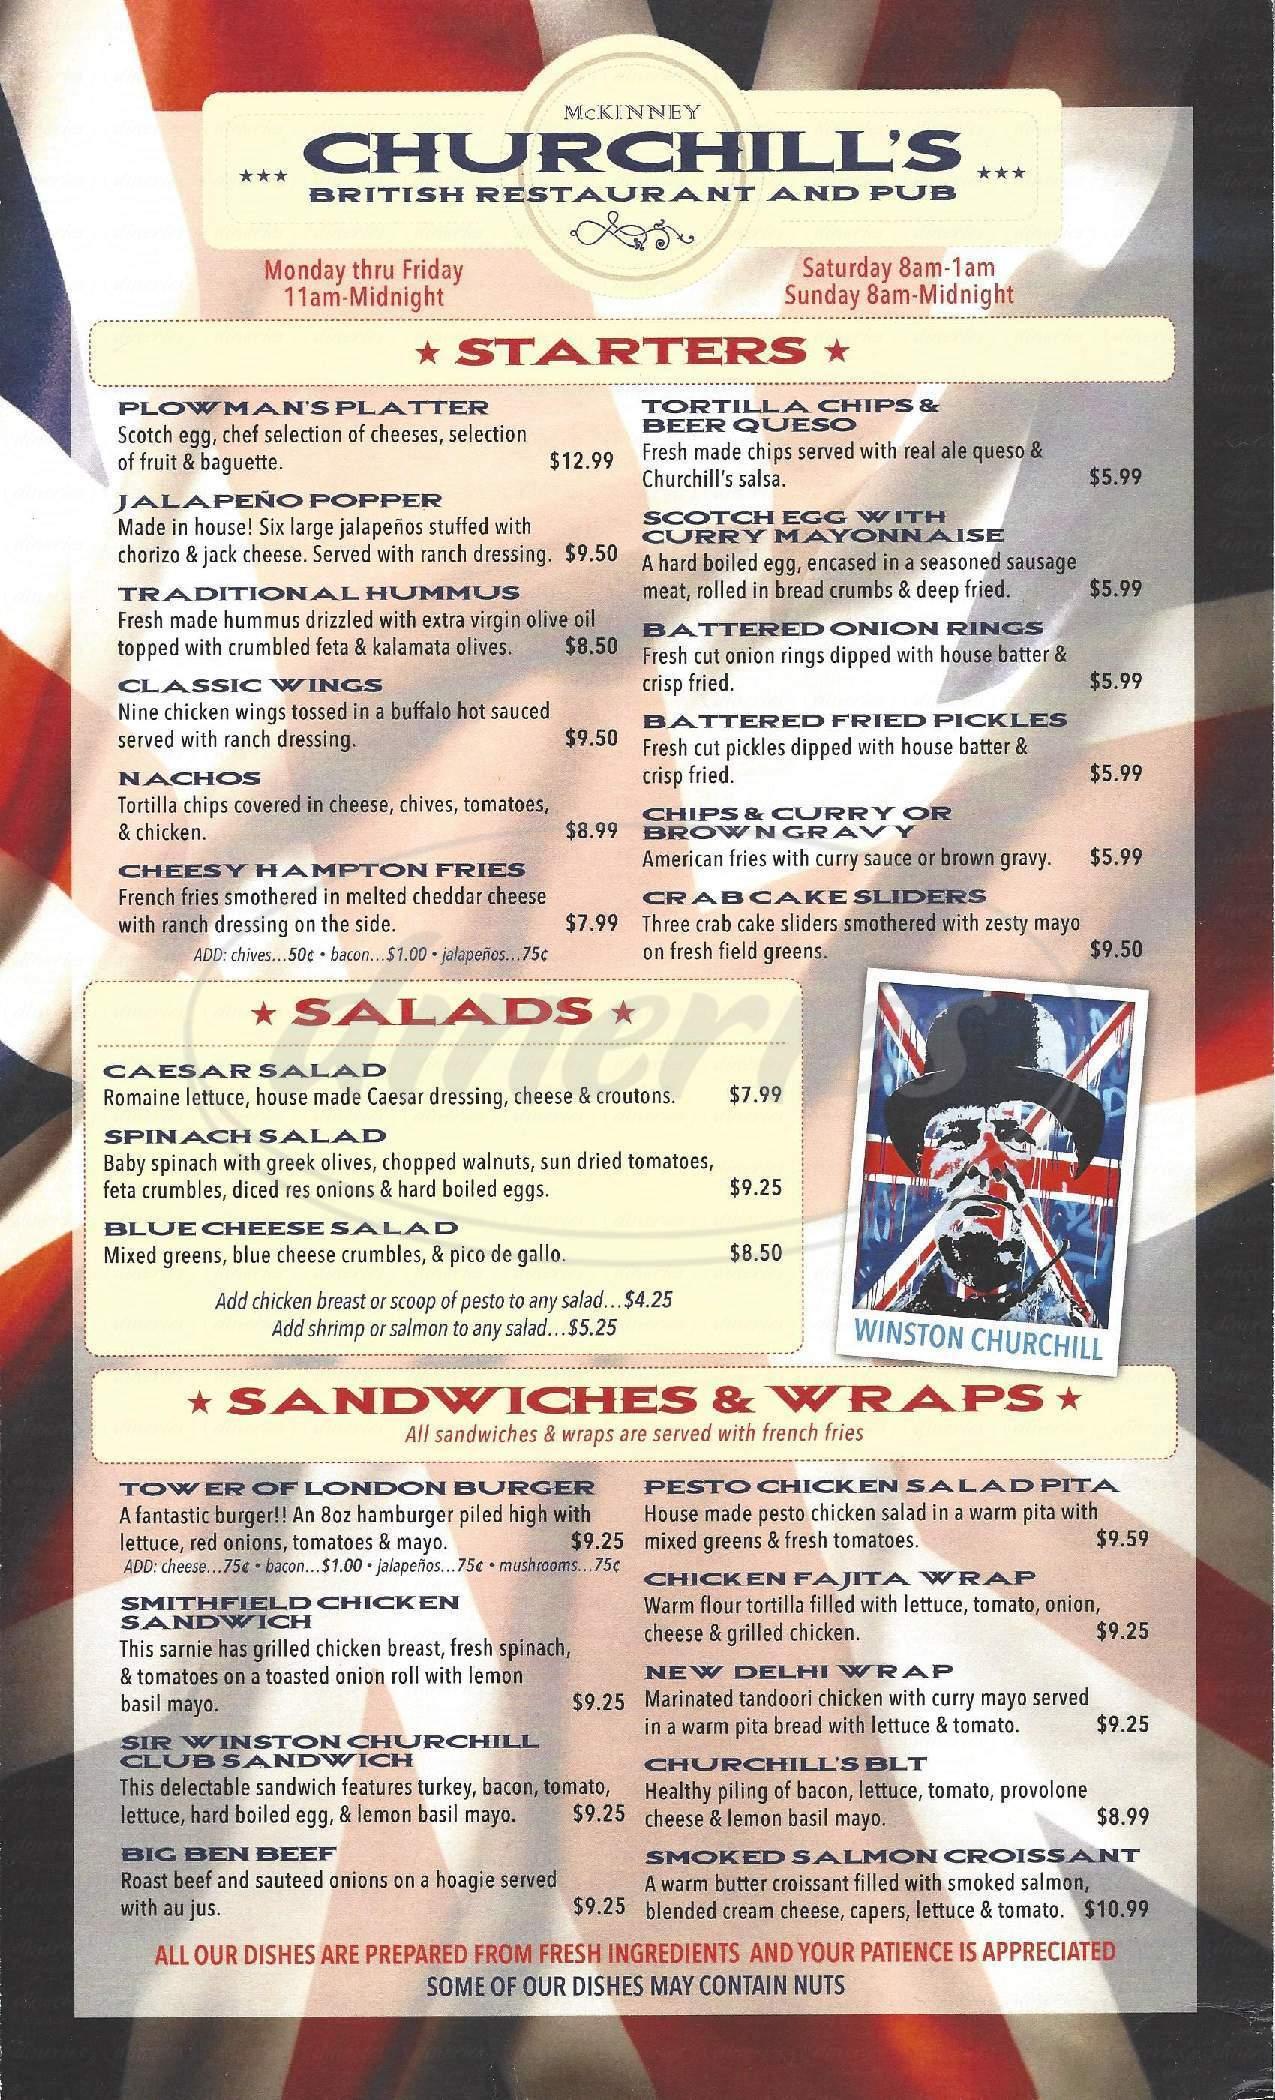 menu for Churchill's British Restaurant and Pub